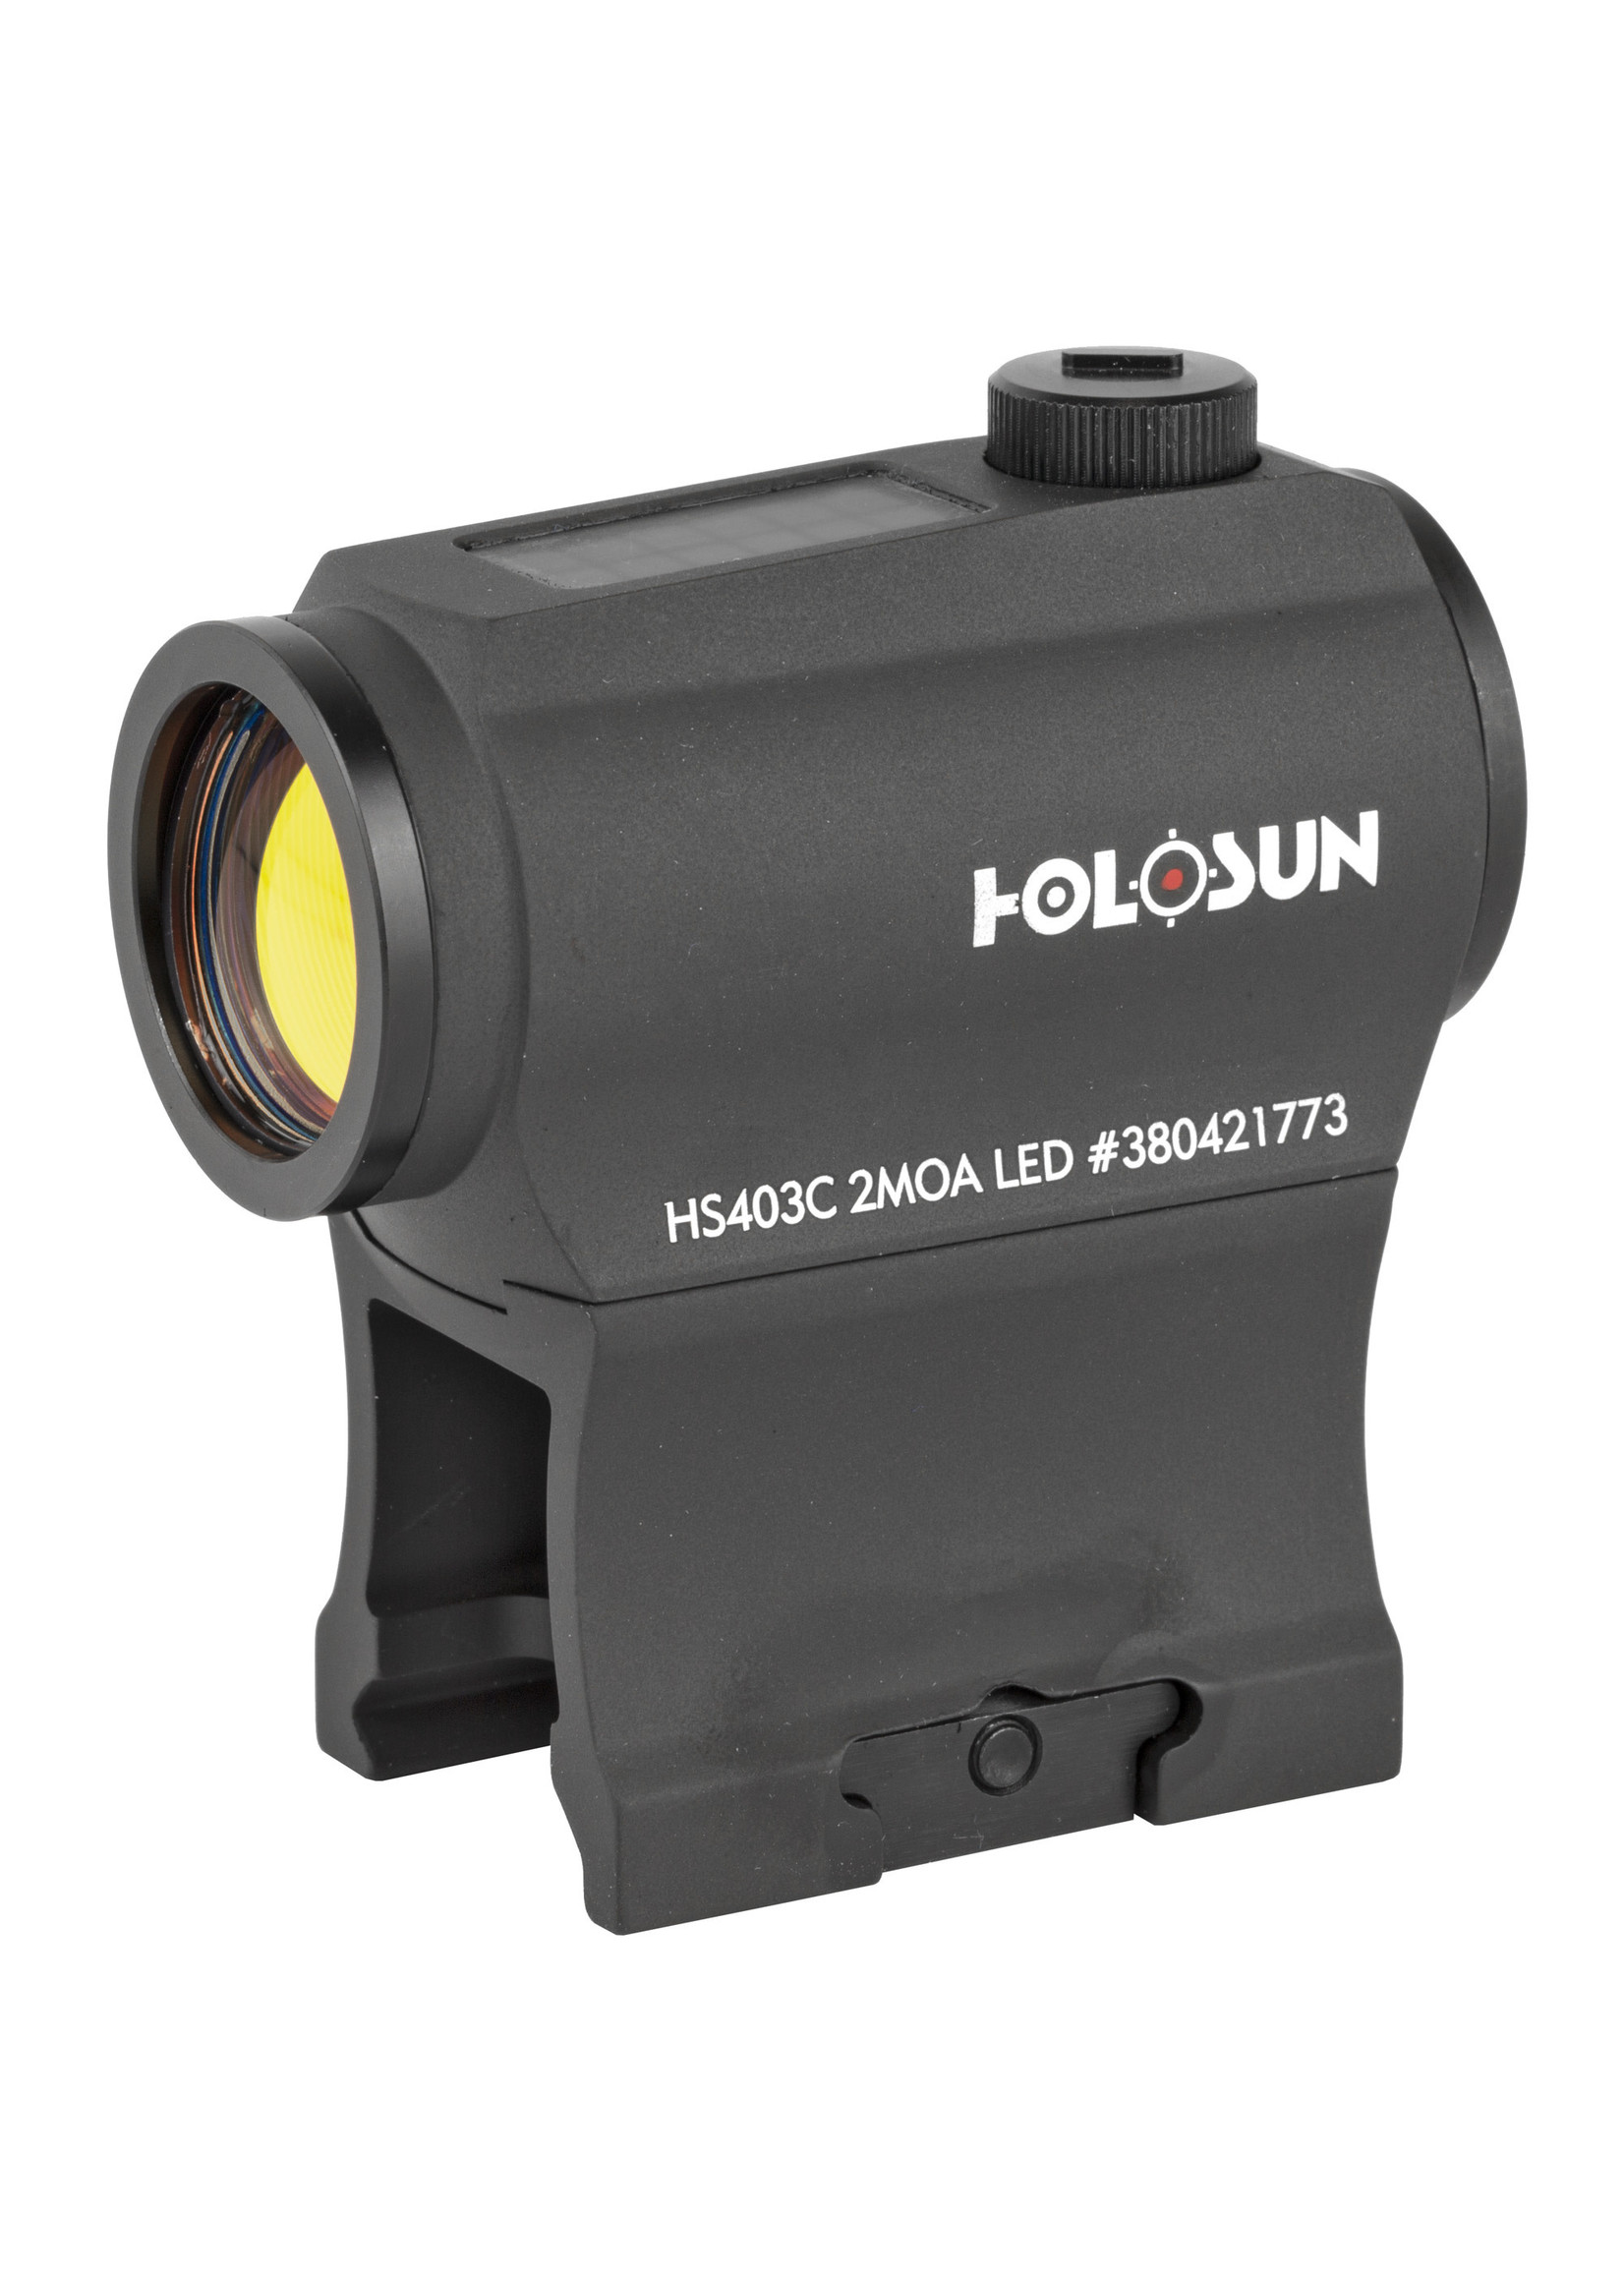 HOLOSUN HOLOSUN RED DOT SOLAR HS403C